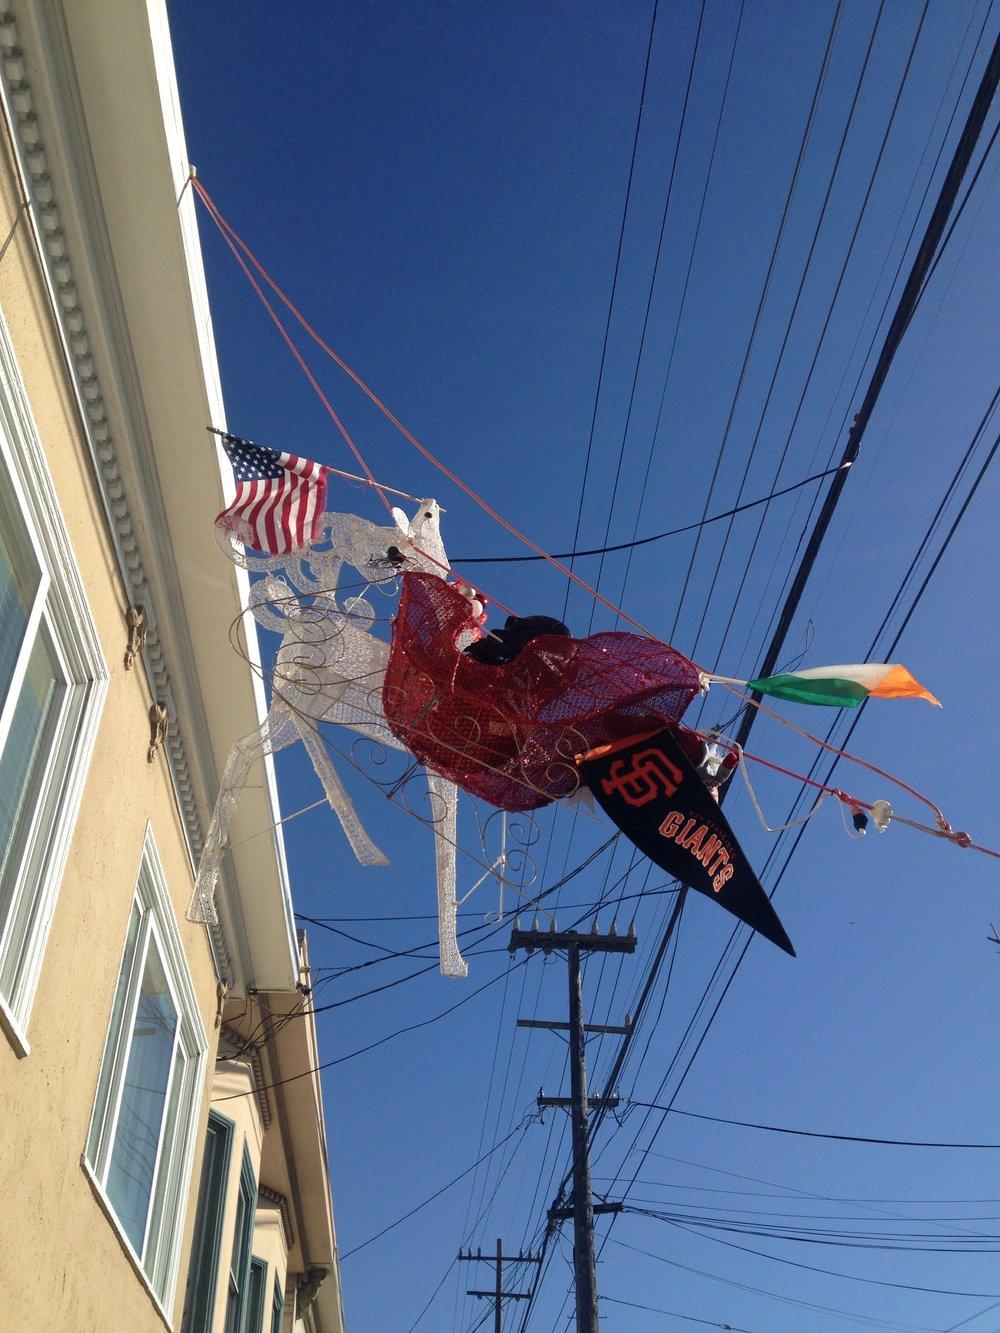 Decorations along Balboa Street between 33rd and 34th Avenues, San Francisco, 11 a.m., December 26, 2016